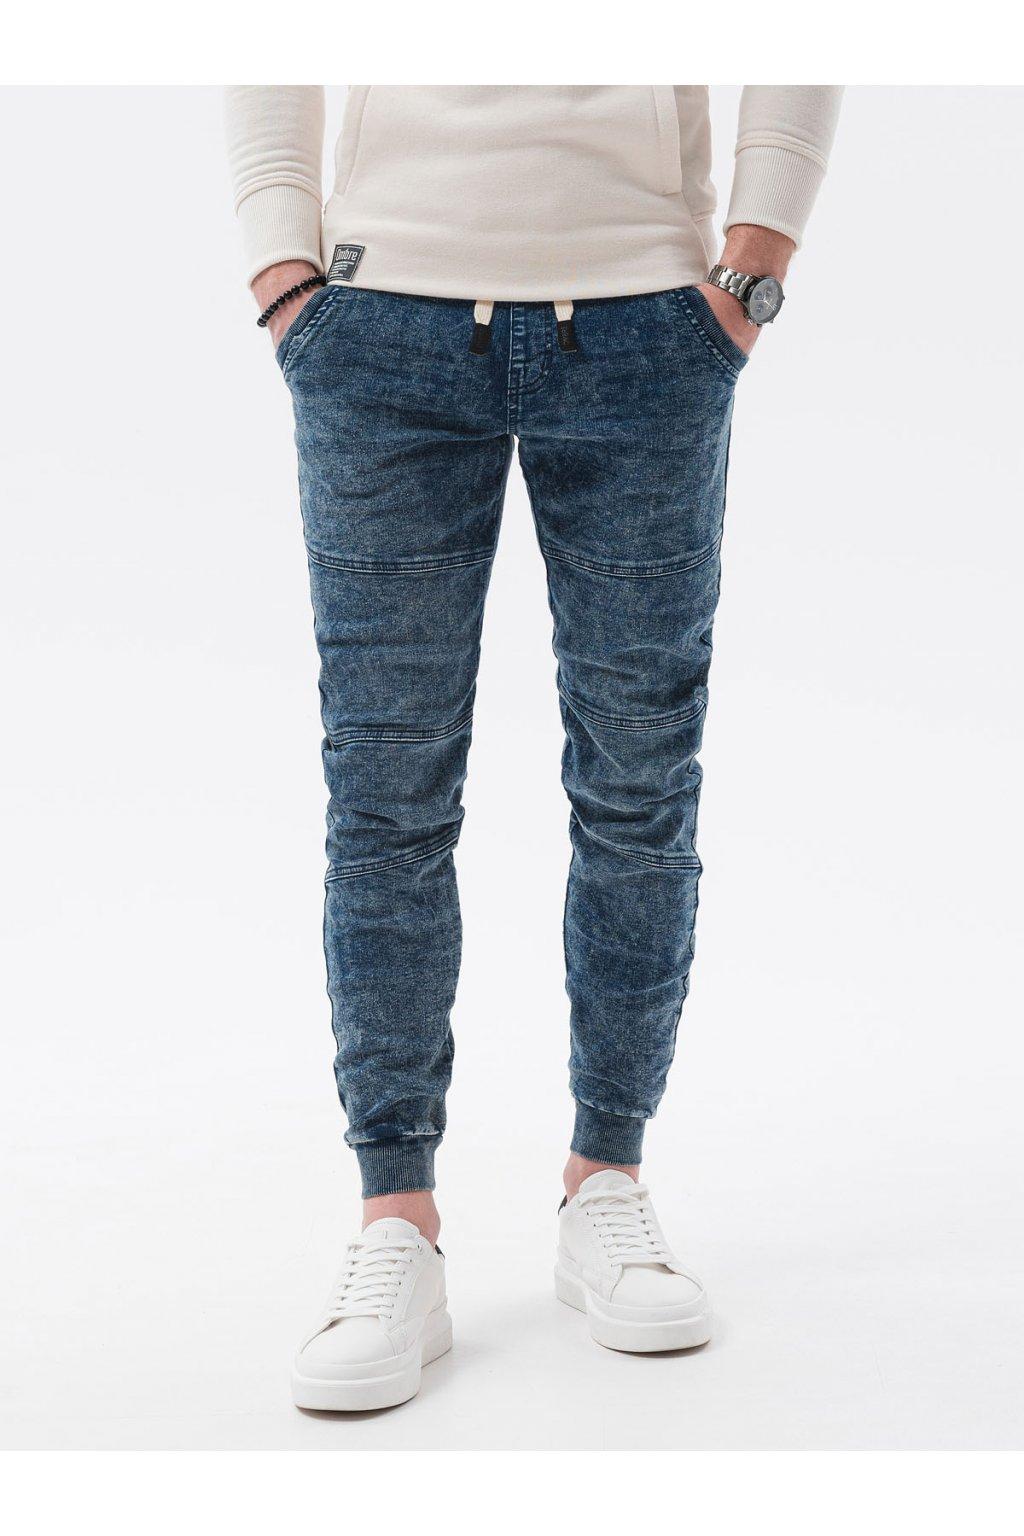 Pánské jogger jeans P551 - modrá